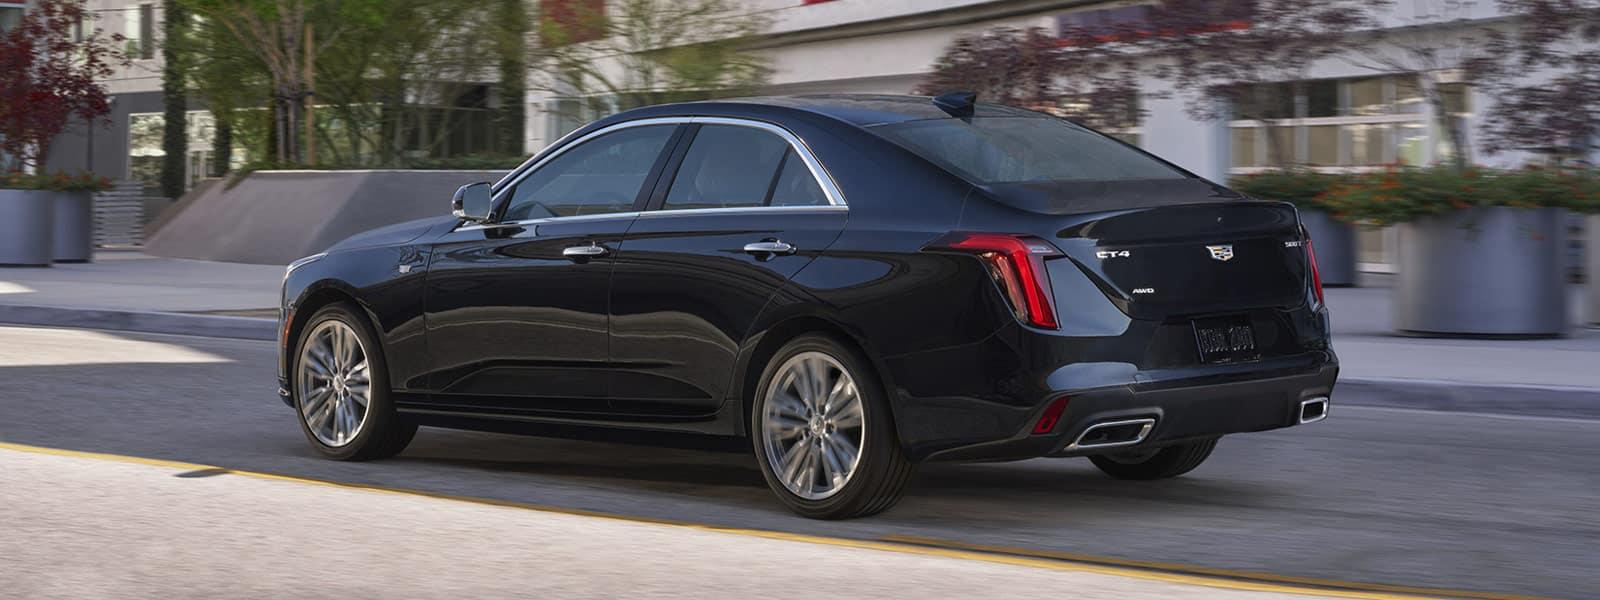 Buy or lease new 2021 Cadillac CT4 in Woodbridge Ontario